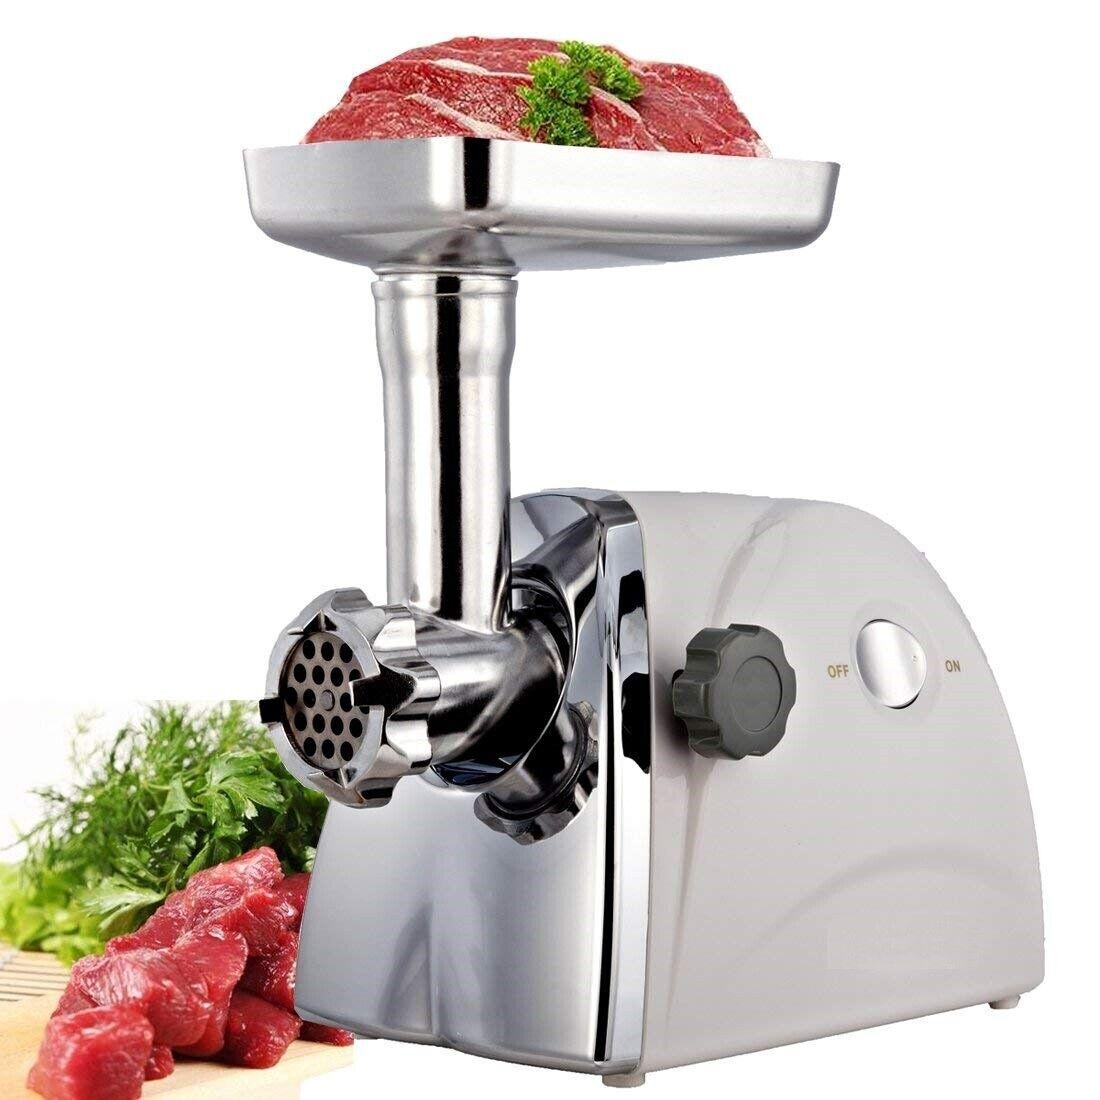 Potente Picadora De Carne Para Embutidos De 800W Potencia Maxima Con Accesorios